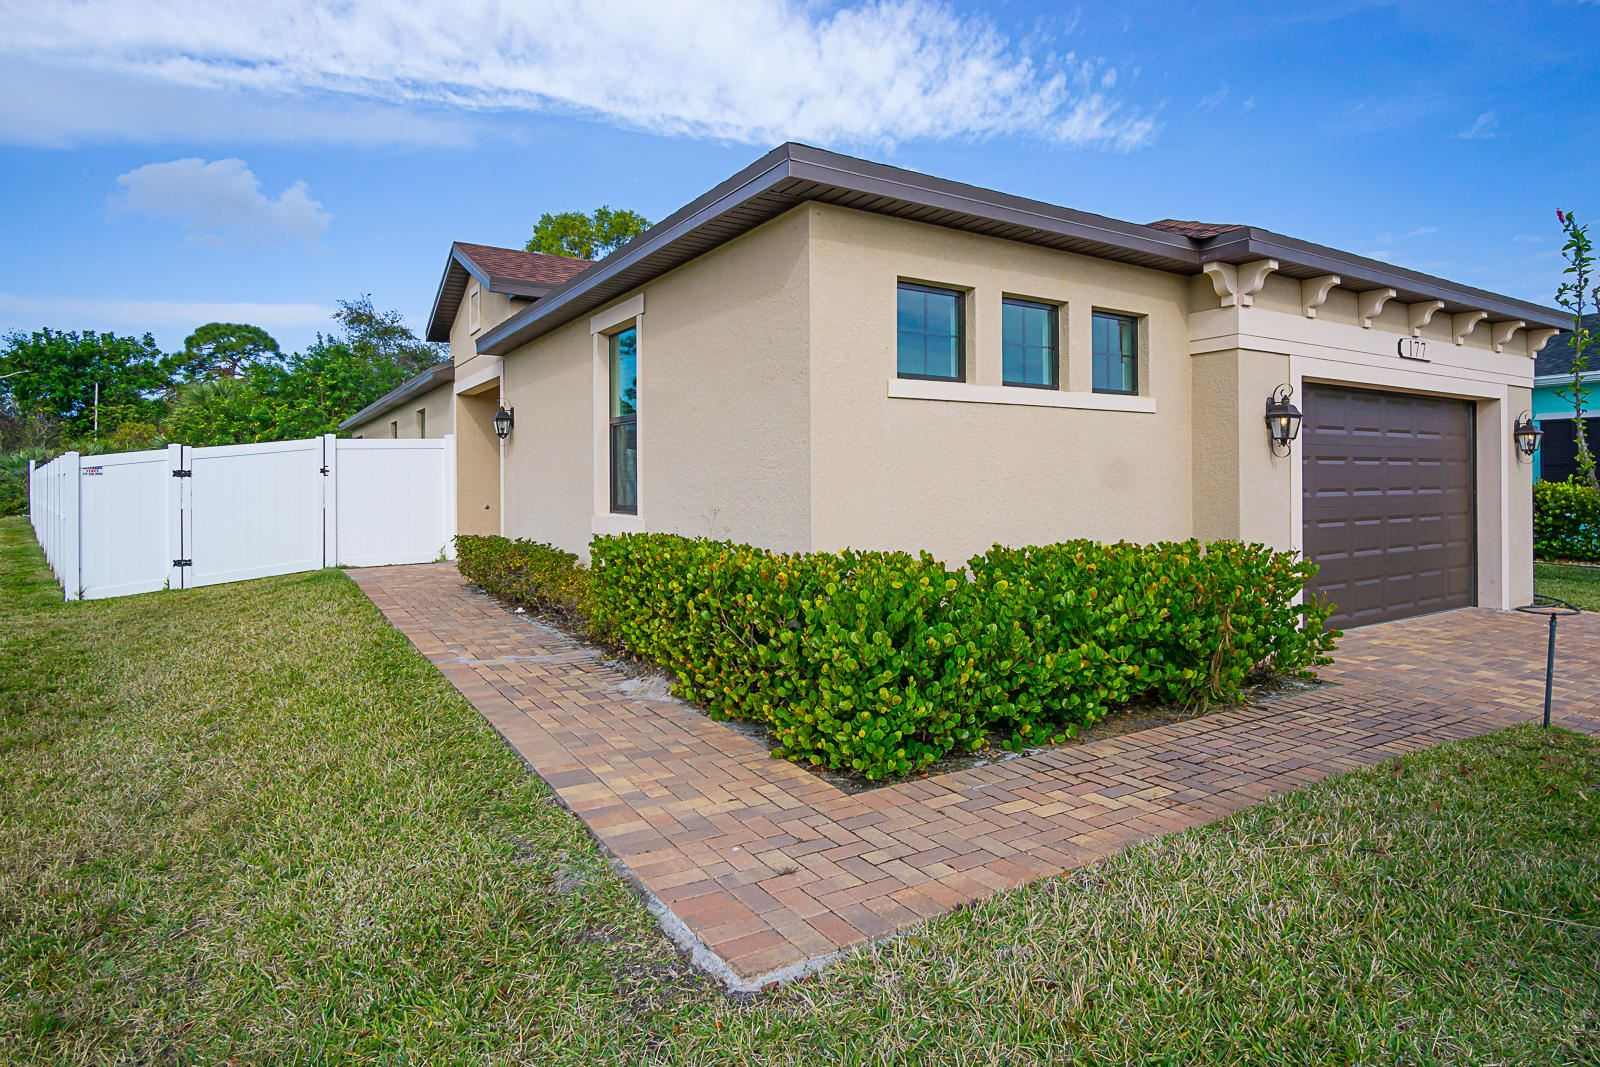 177 SE Via Visconti, Port Saint Lucie, FL 34952 - #: RX-10685785